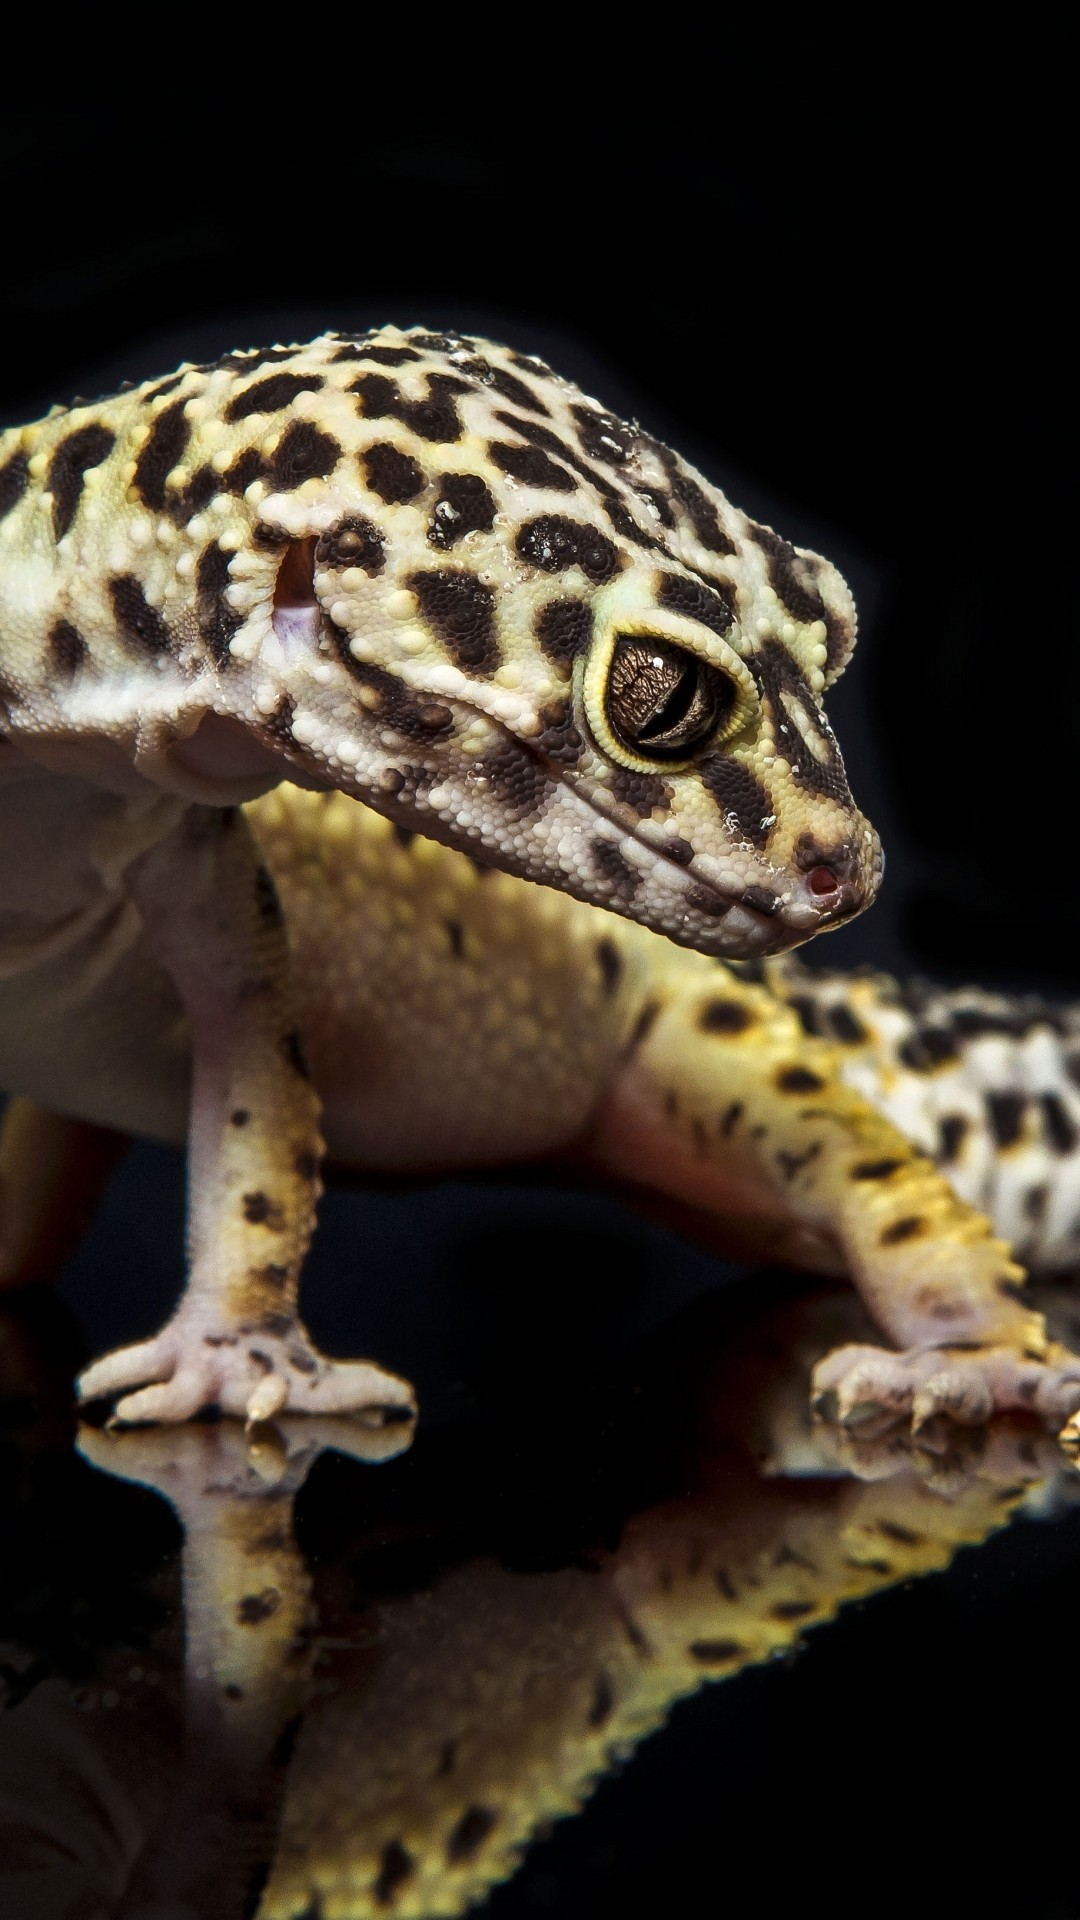 Leopard Gecko Wallpaper 59 Images